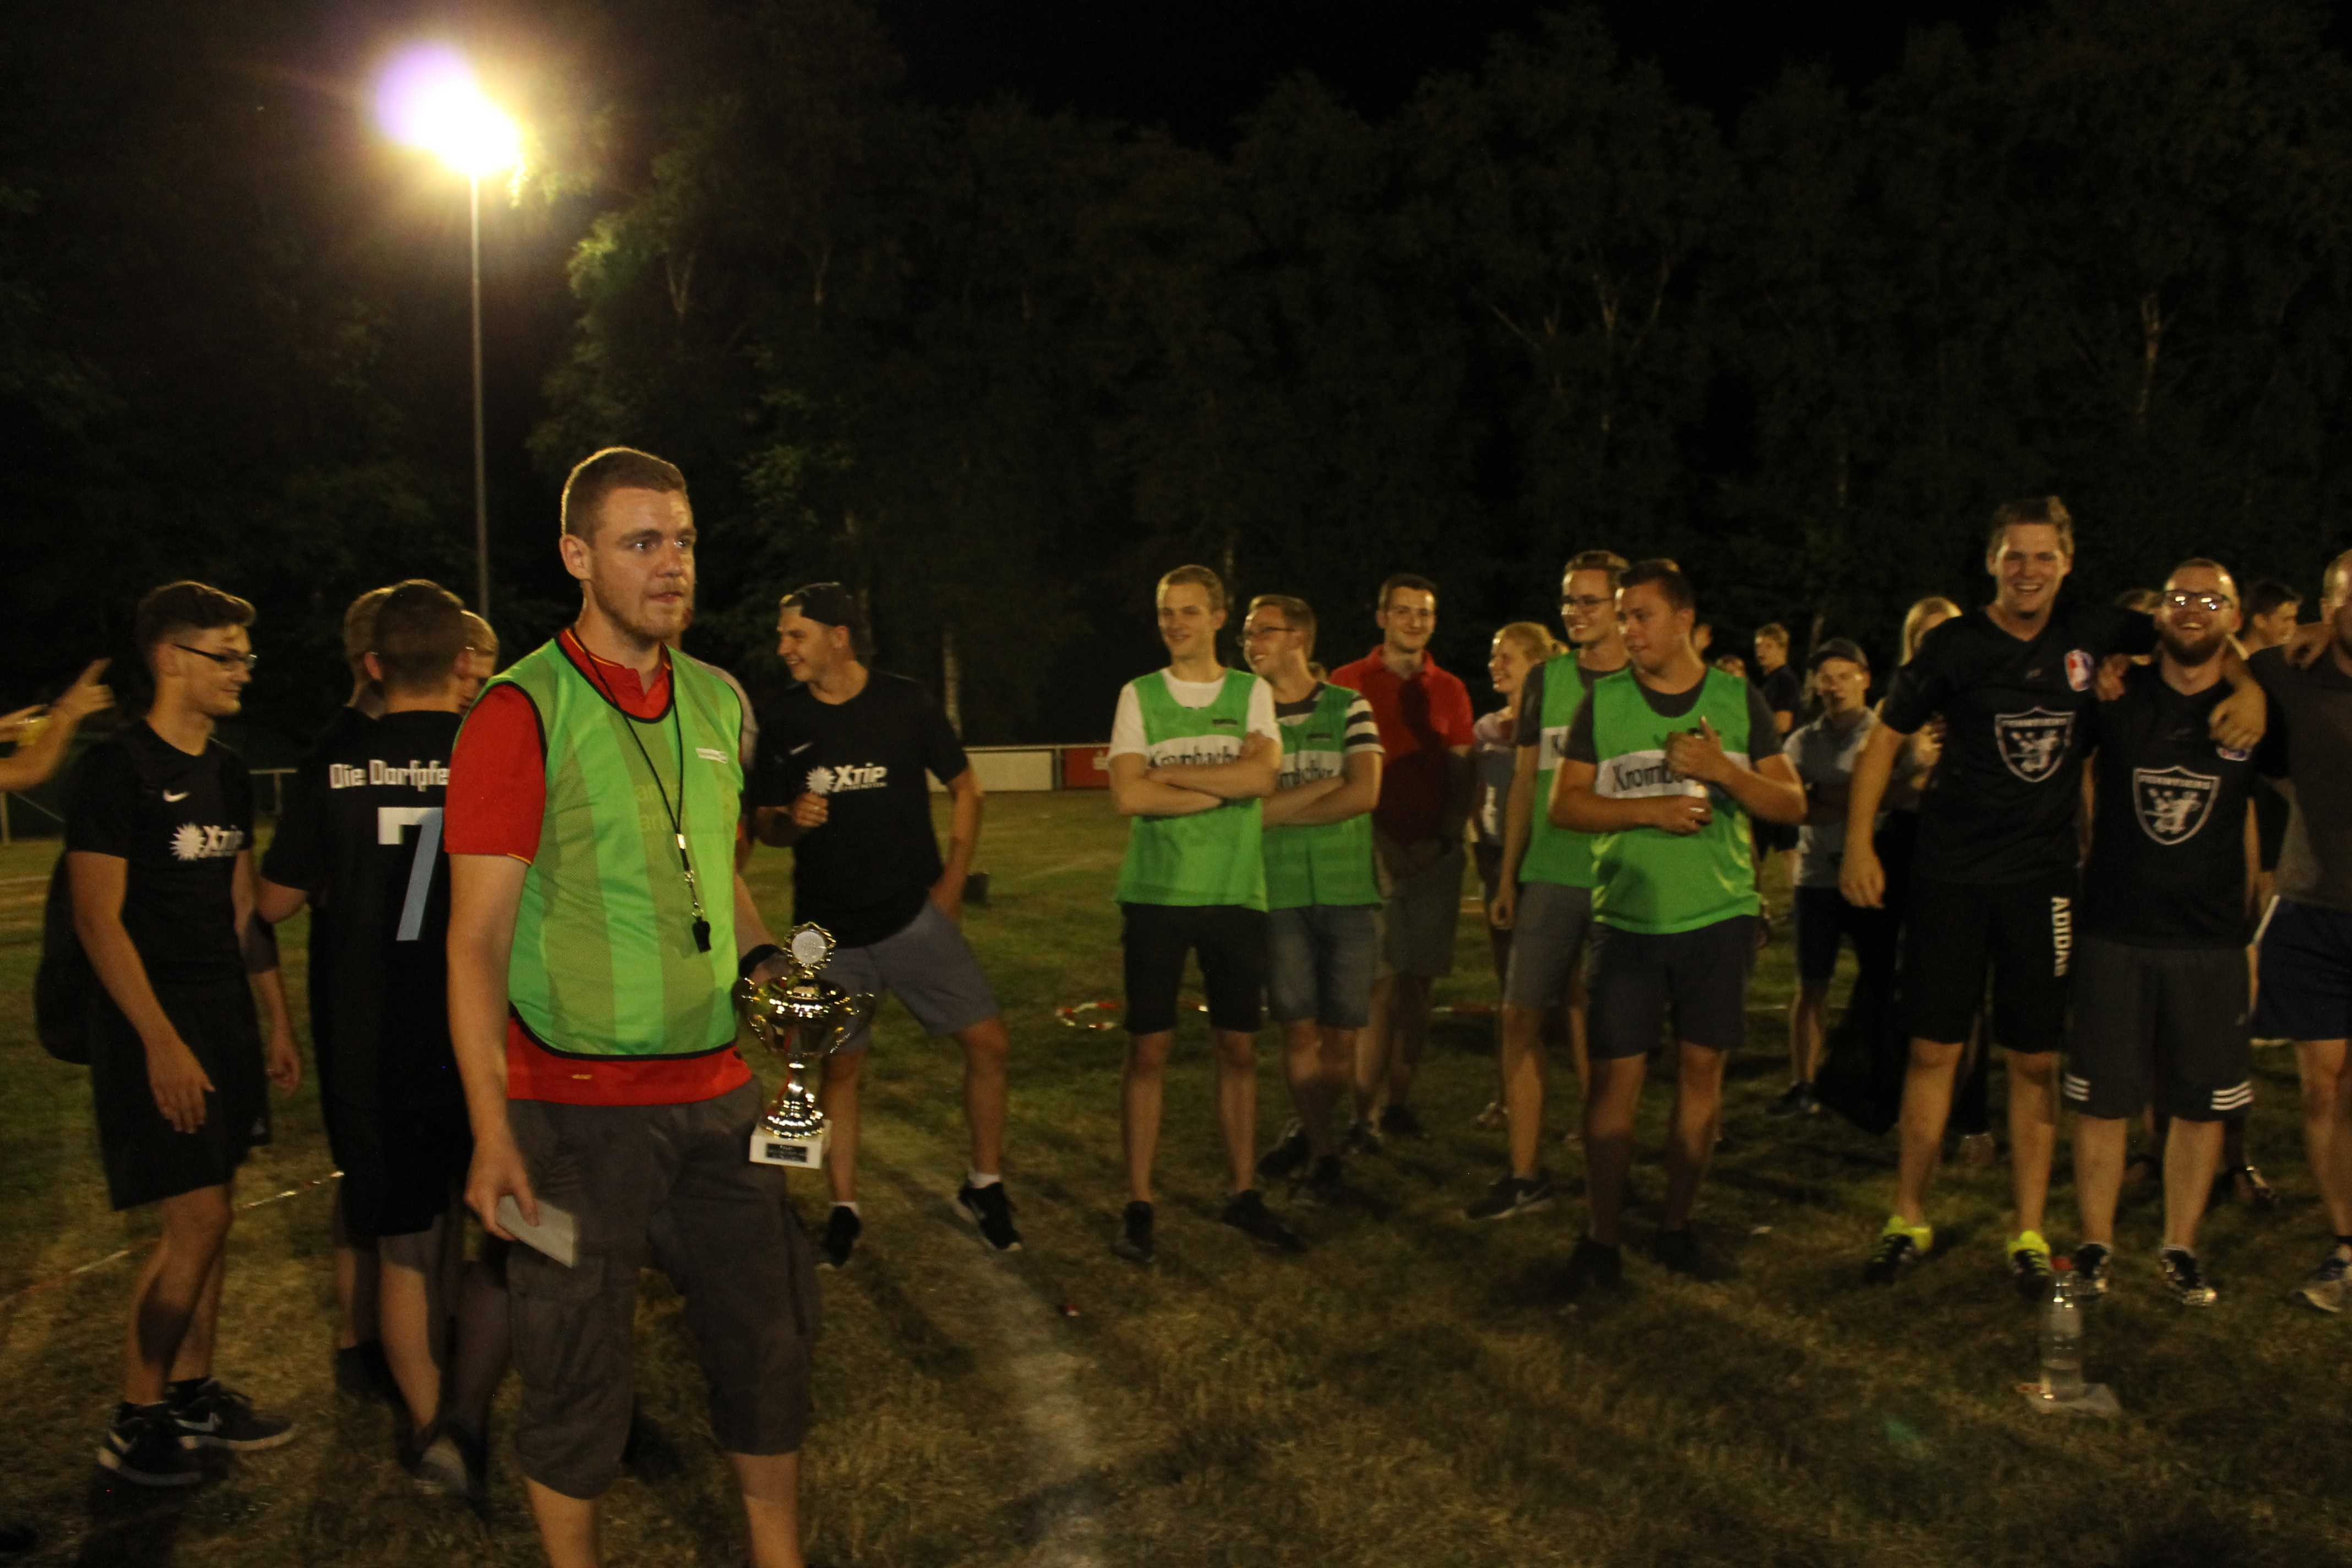 2018-07-27 Sportwoche - Flunkyball Turnier (94)